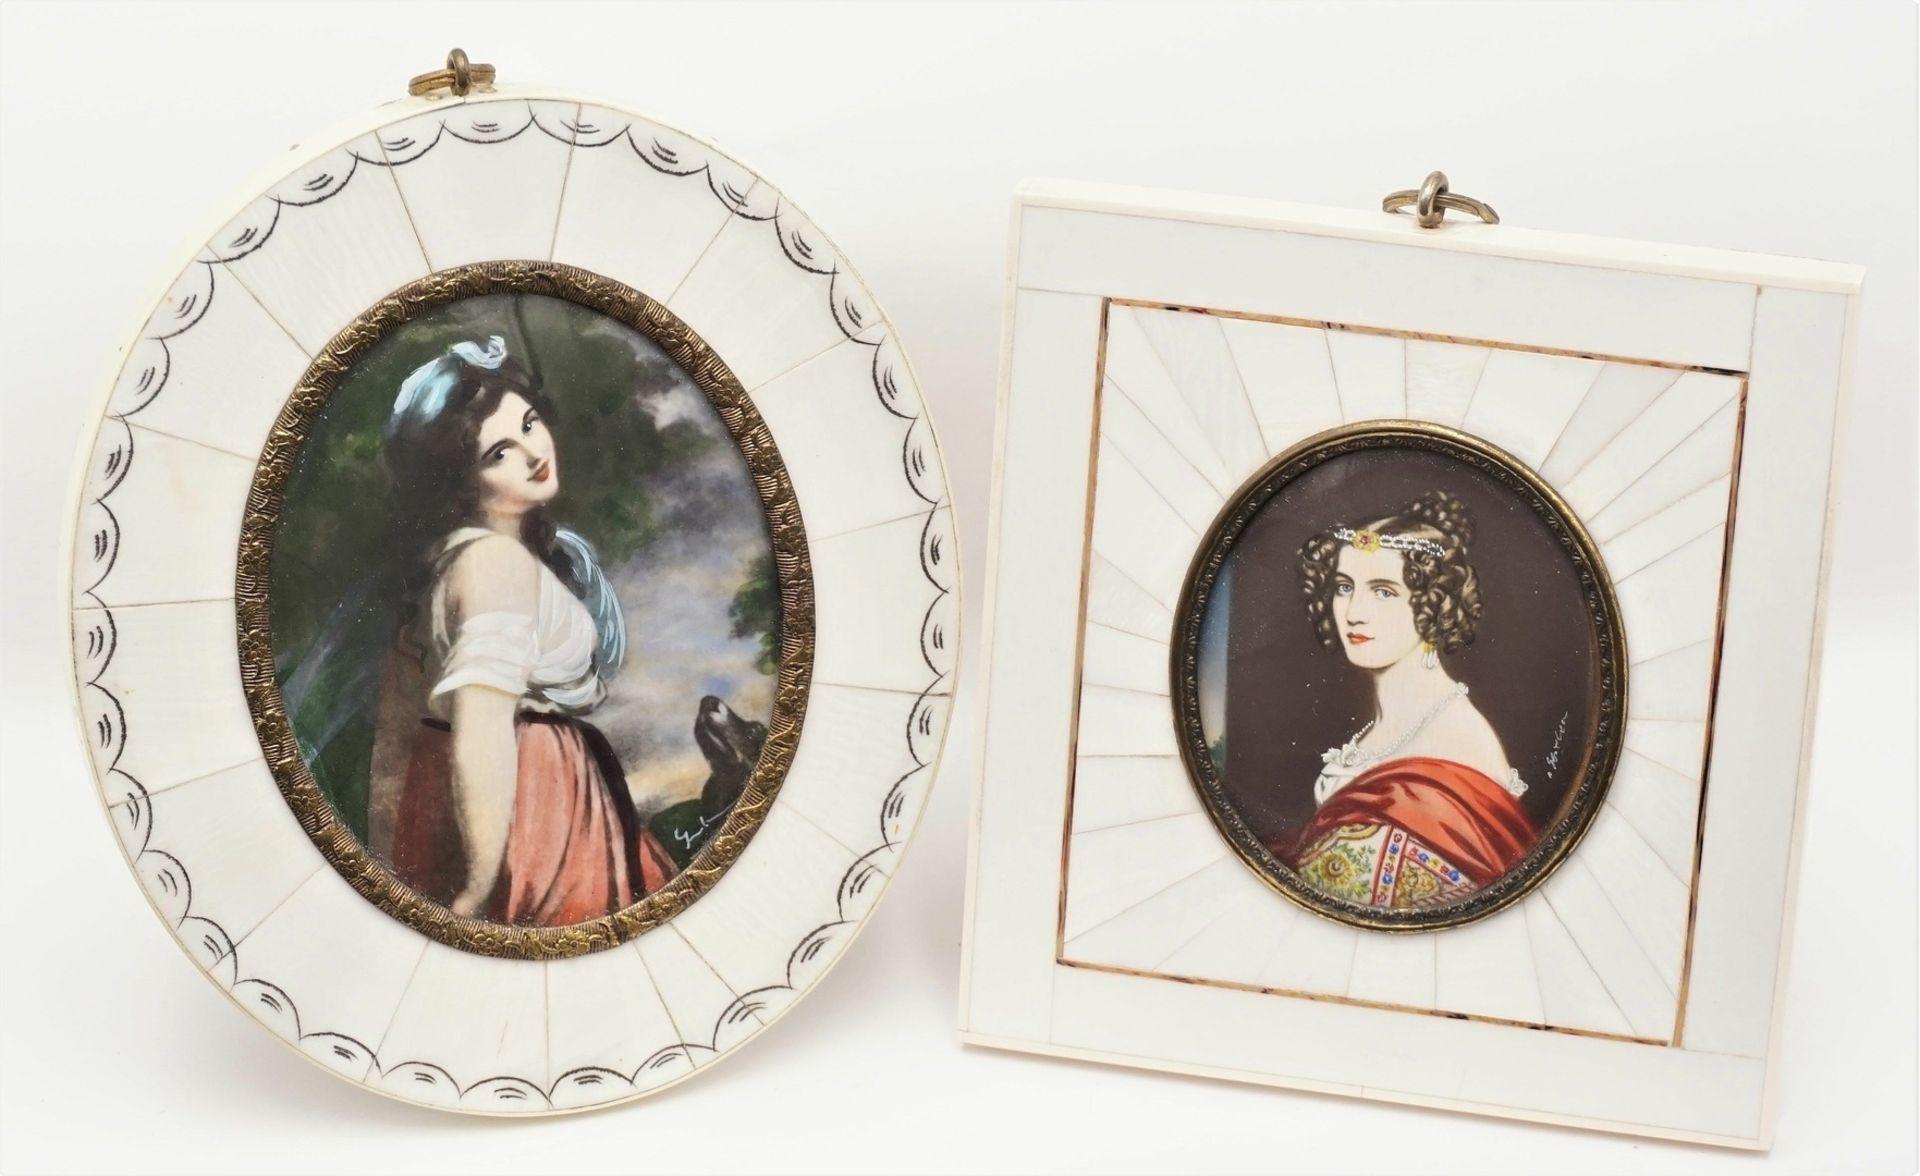 Zwei Miniatur-Portraits